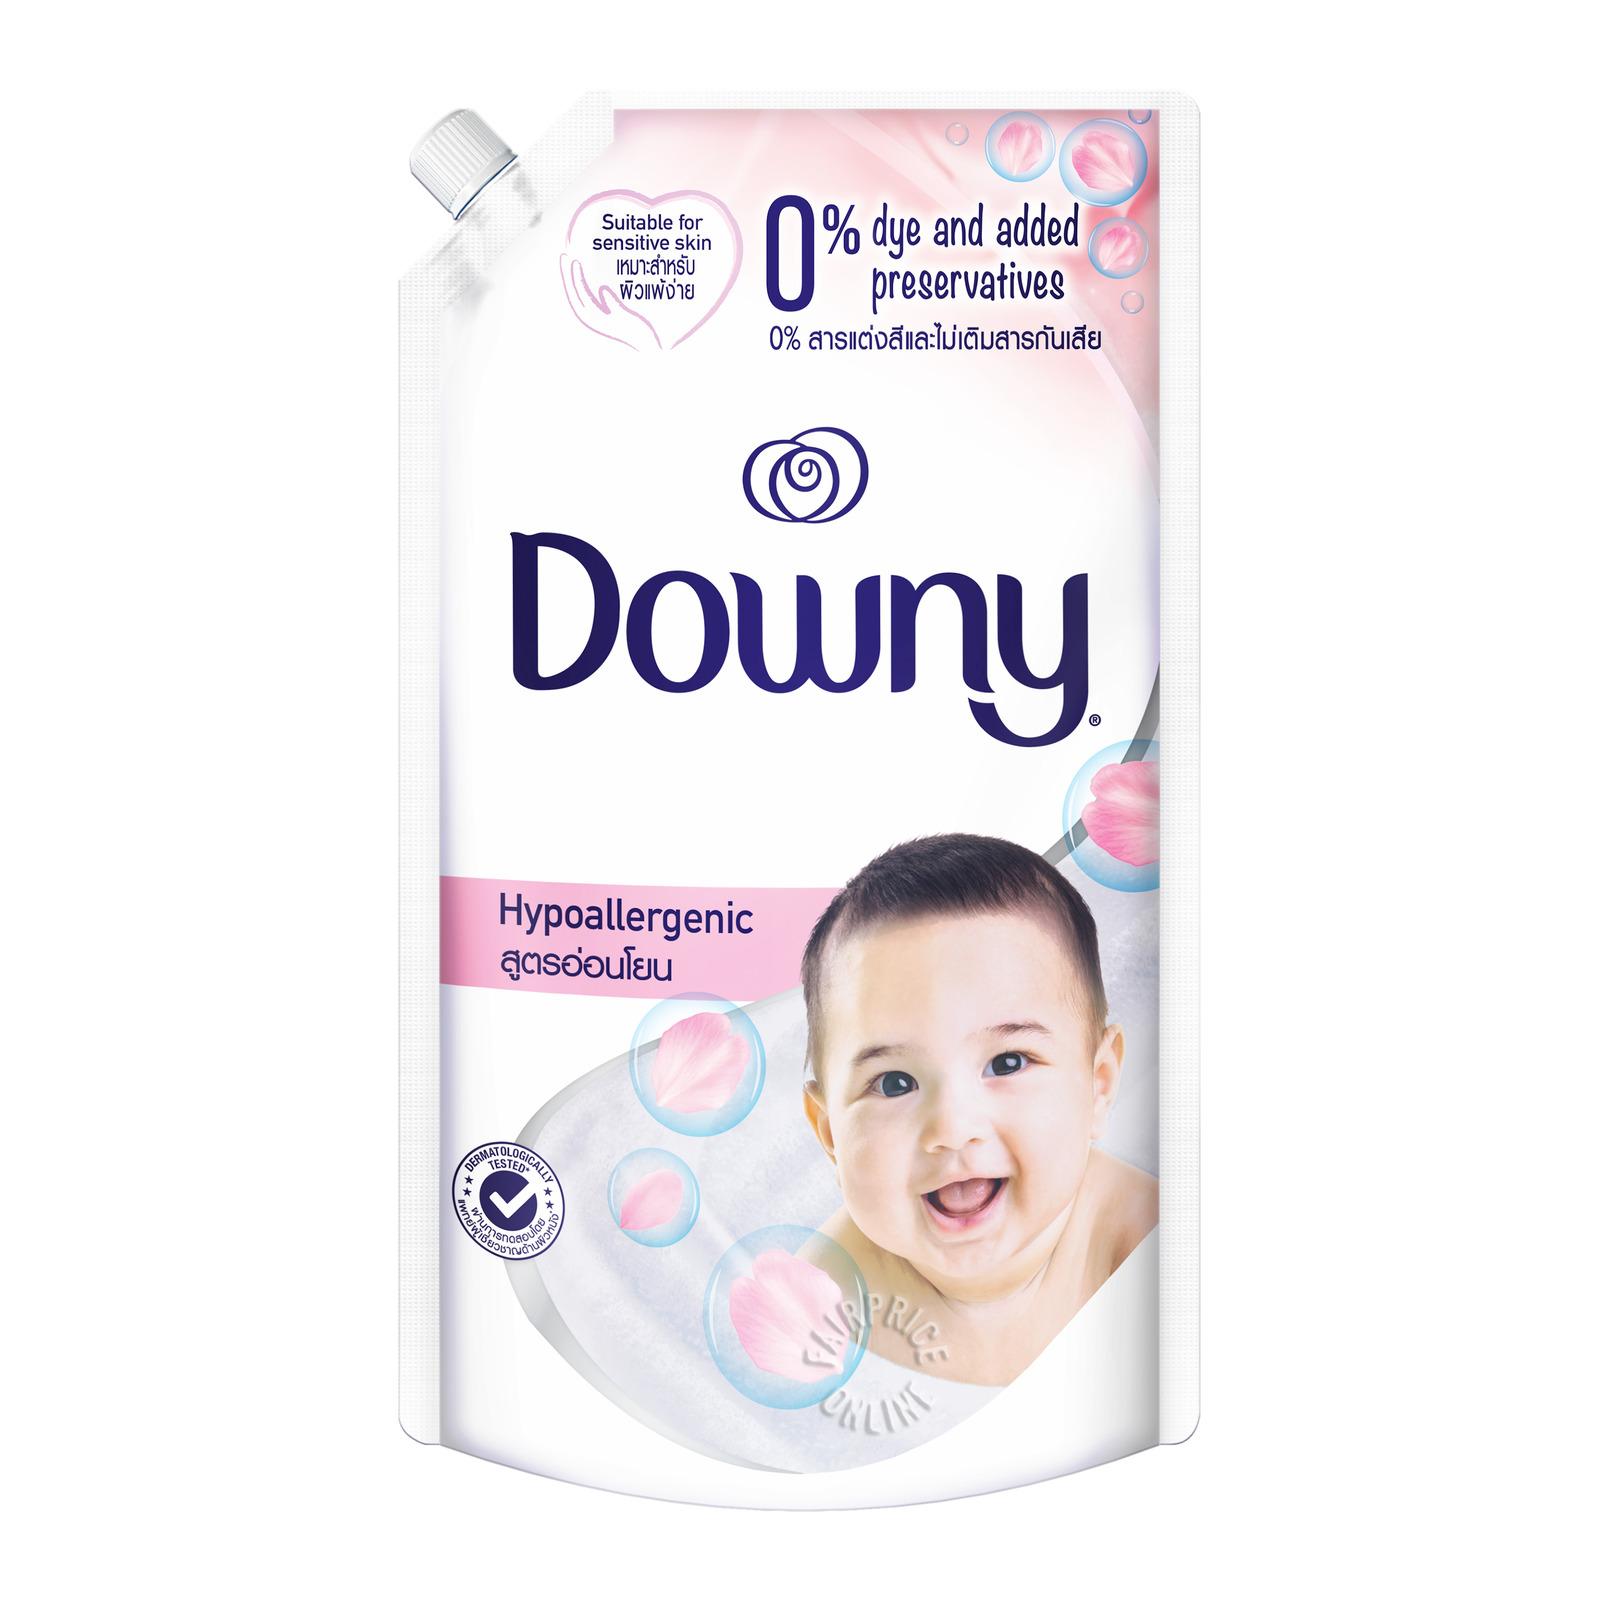 Downy Fabric Conditioner Refill - Hypoallergenic